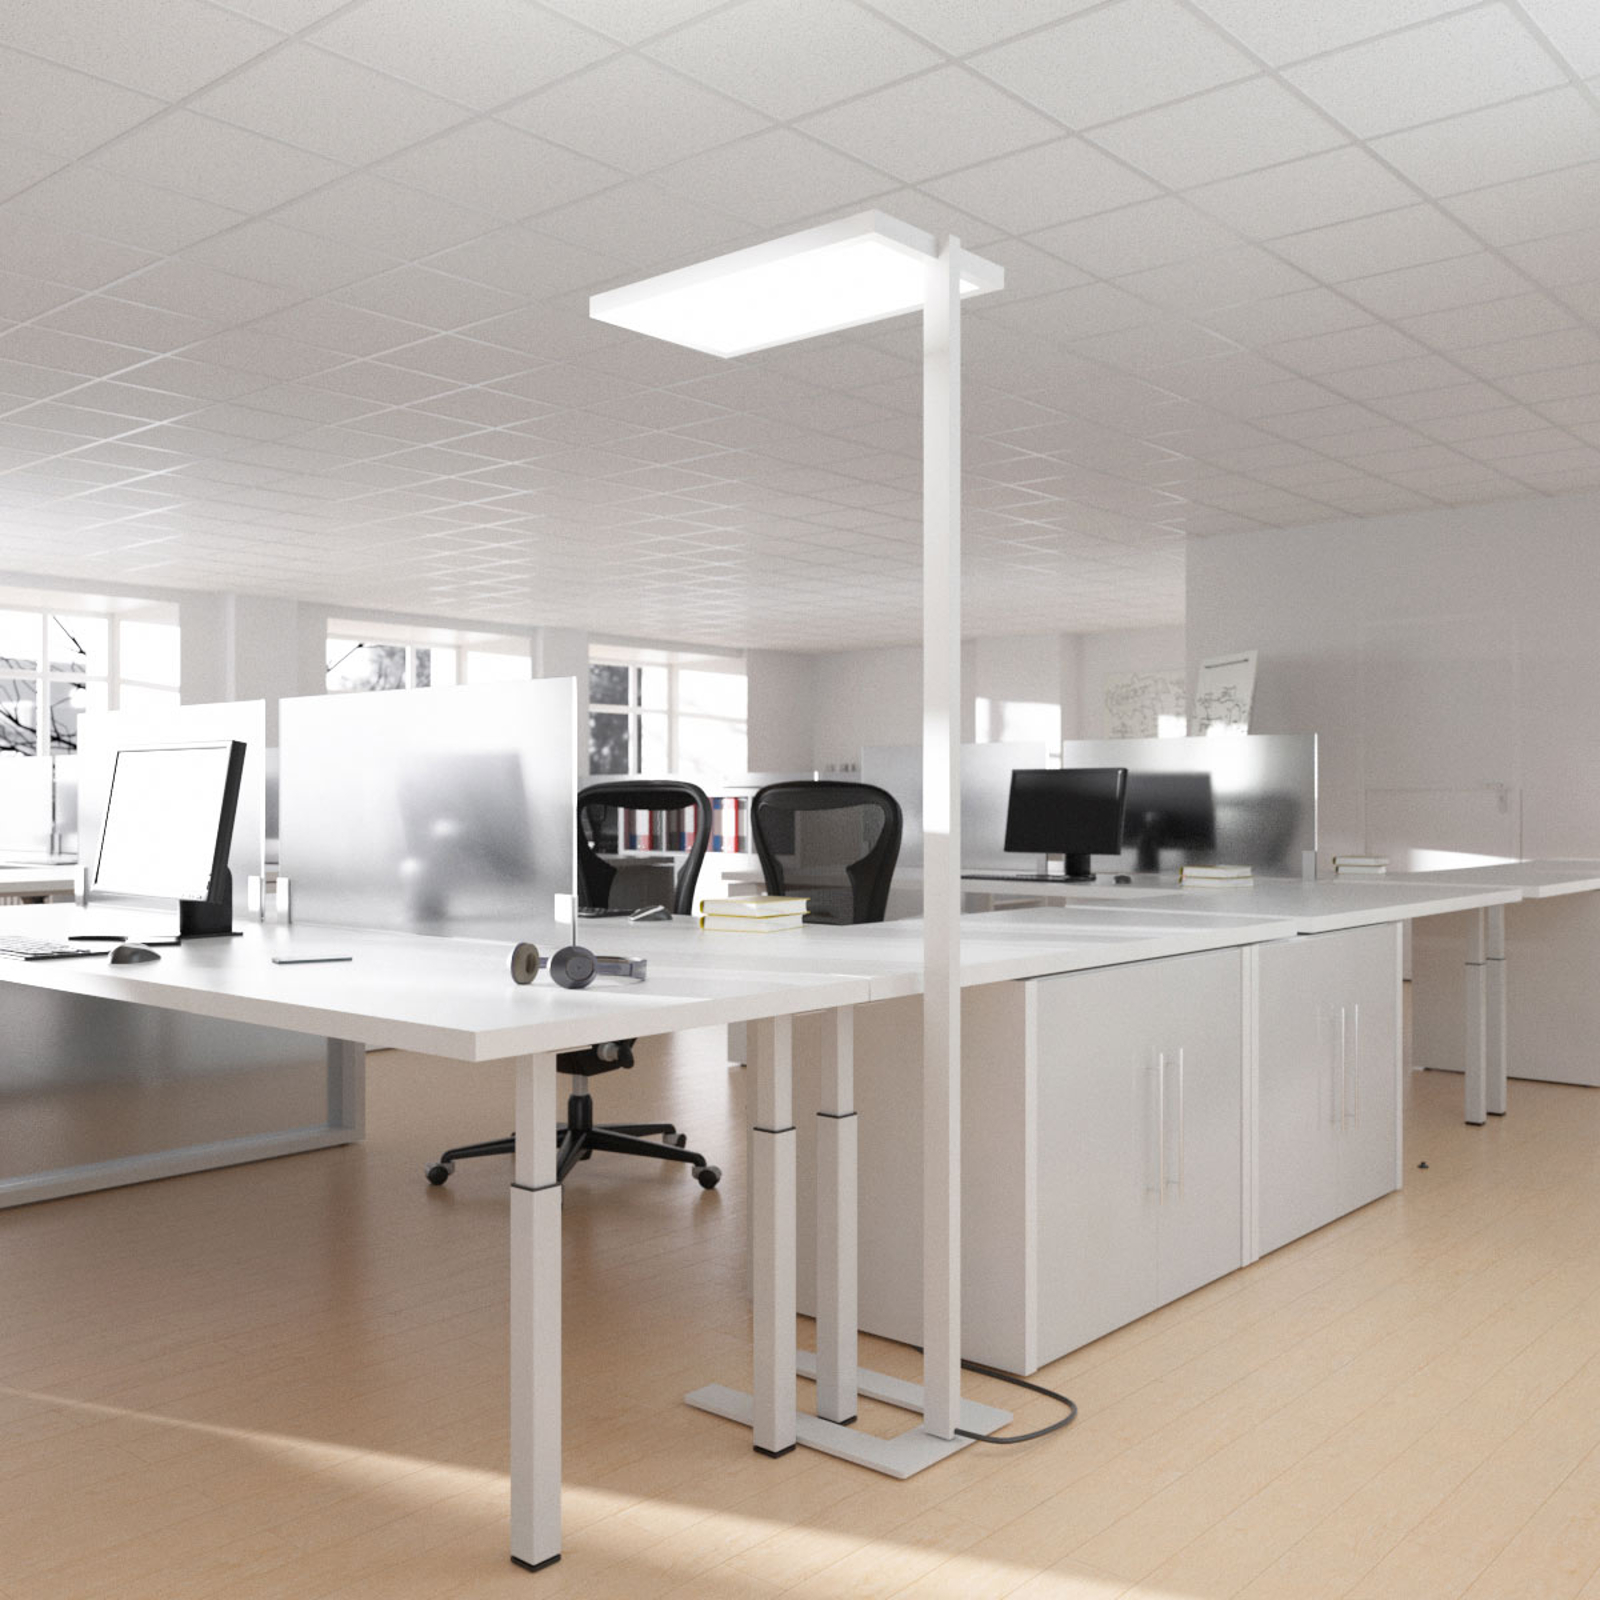 LUXSENSE 1a floor lamp with daylight sensor_6067001_1